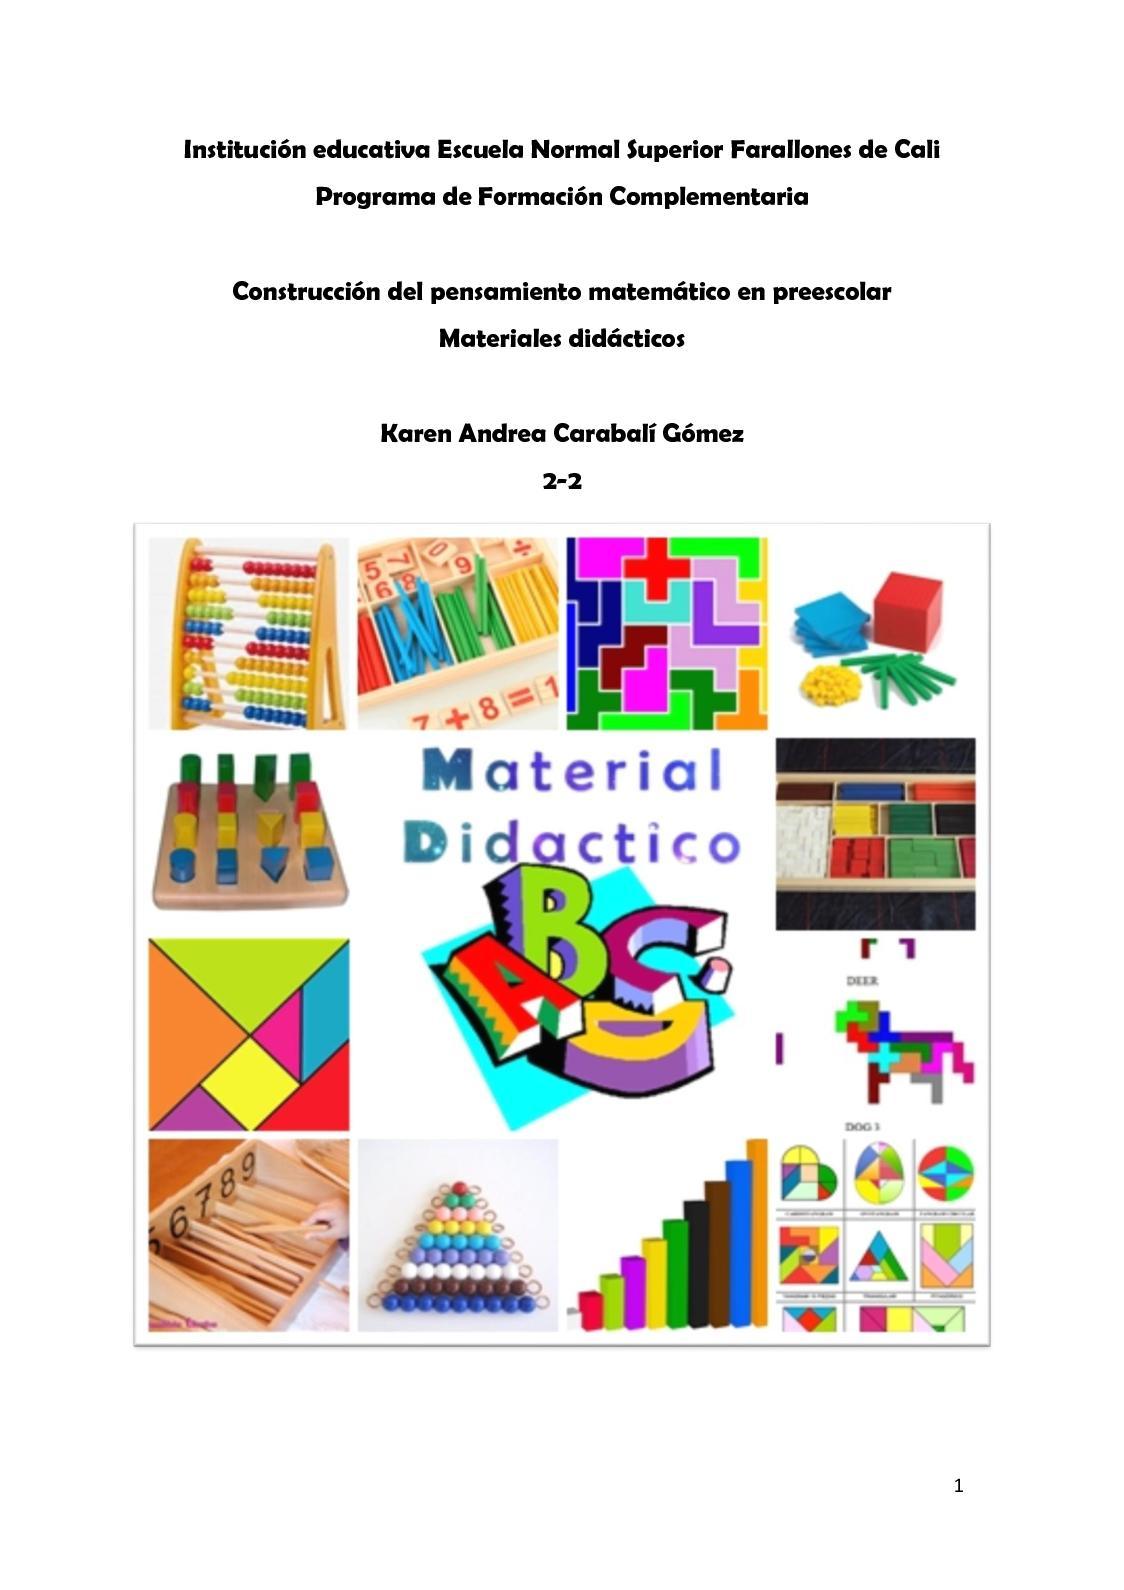 Calam o materiales didacticos karen - Material de construccion segunda mano ...